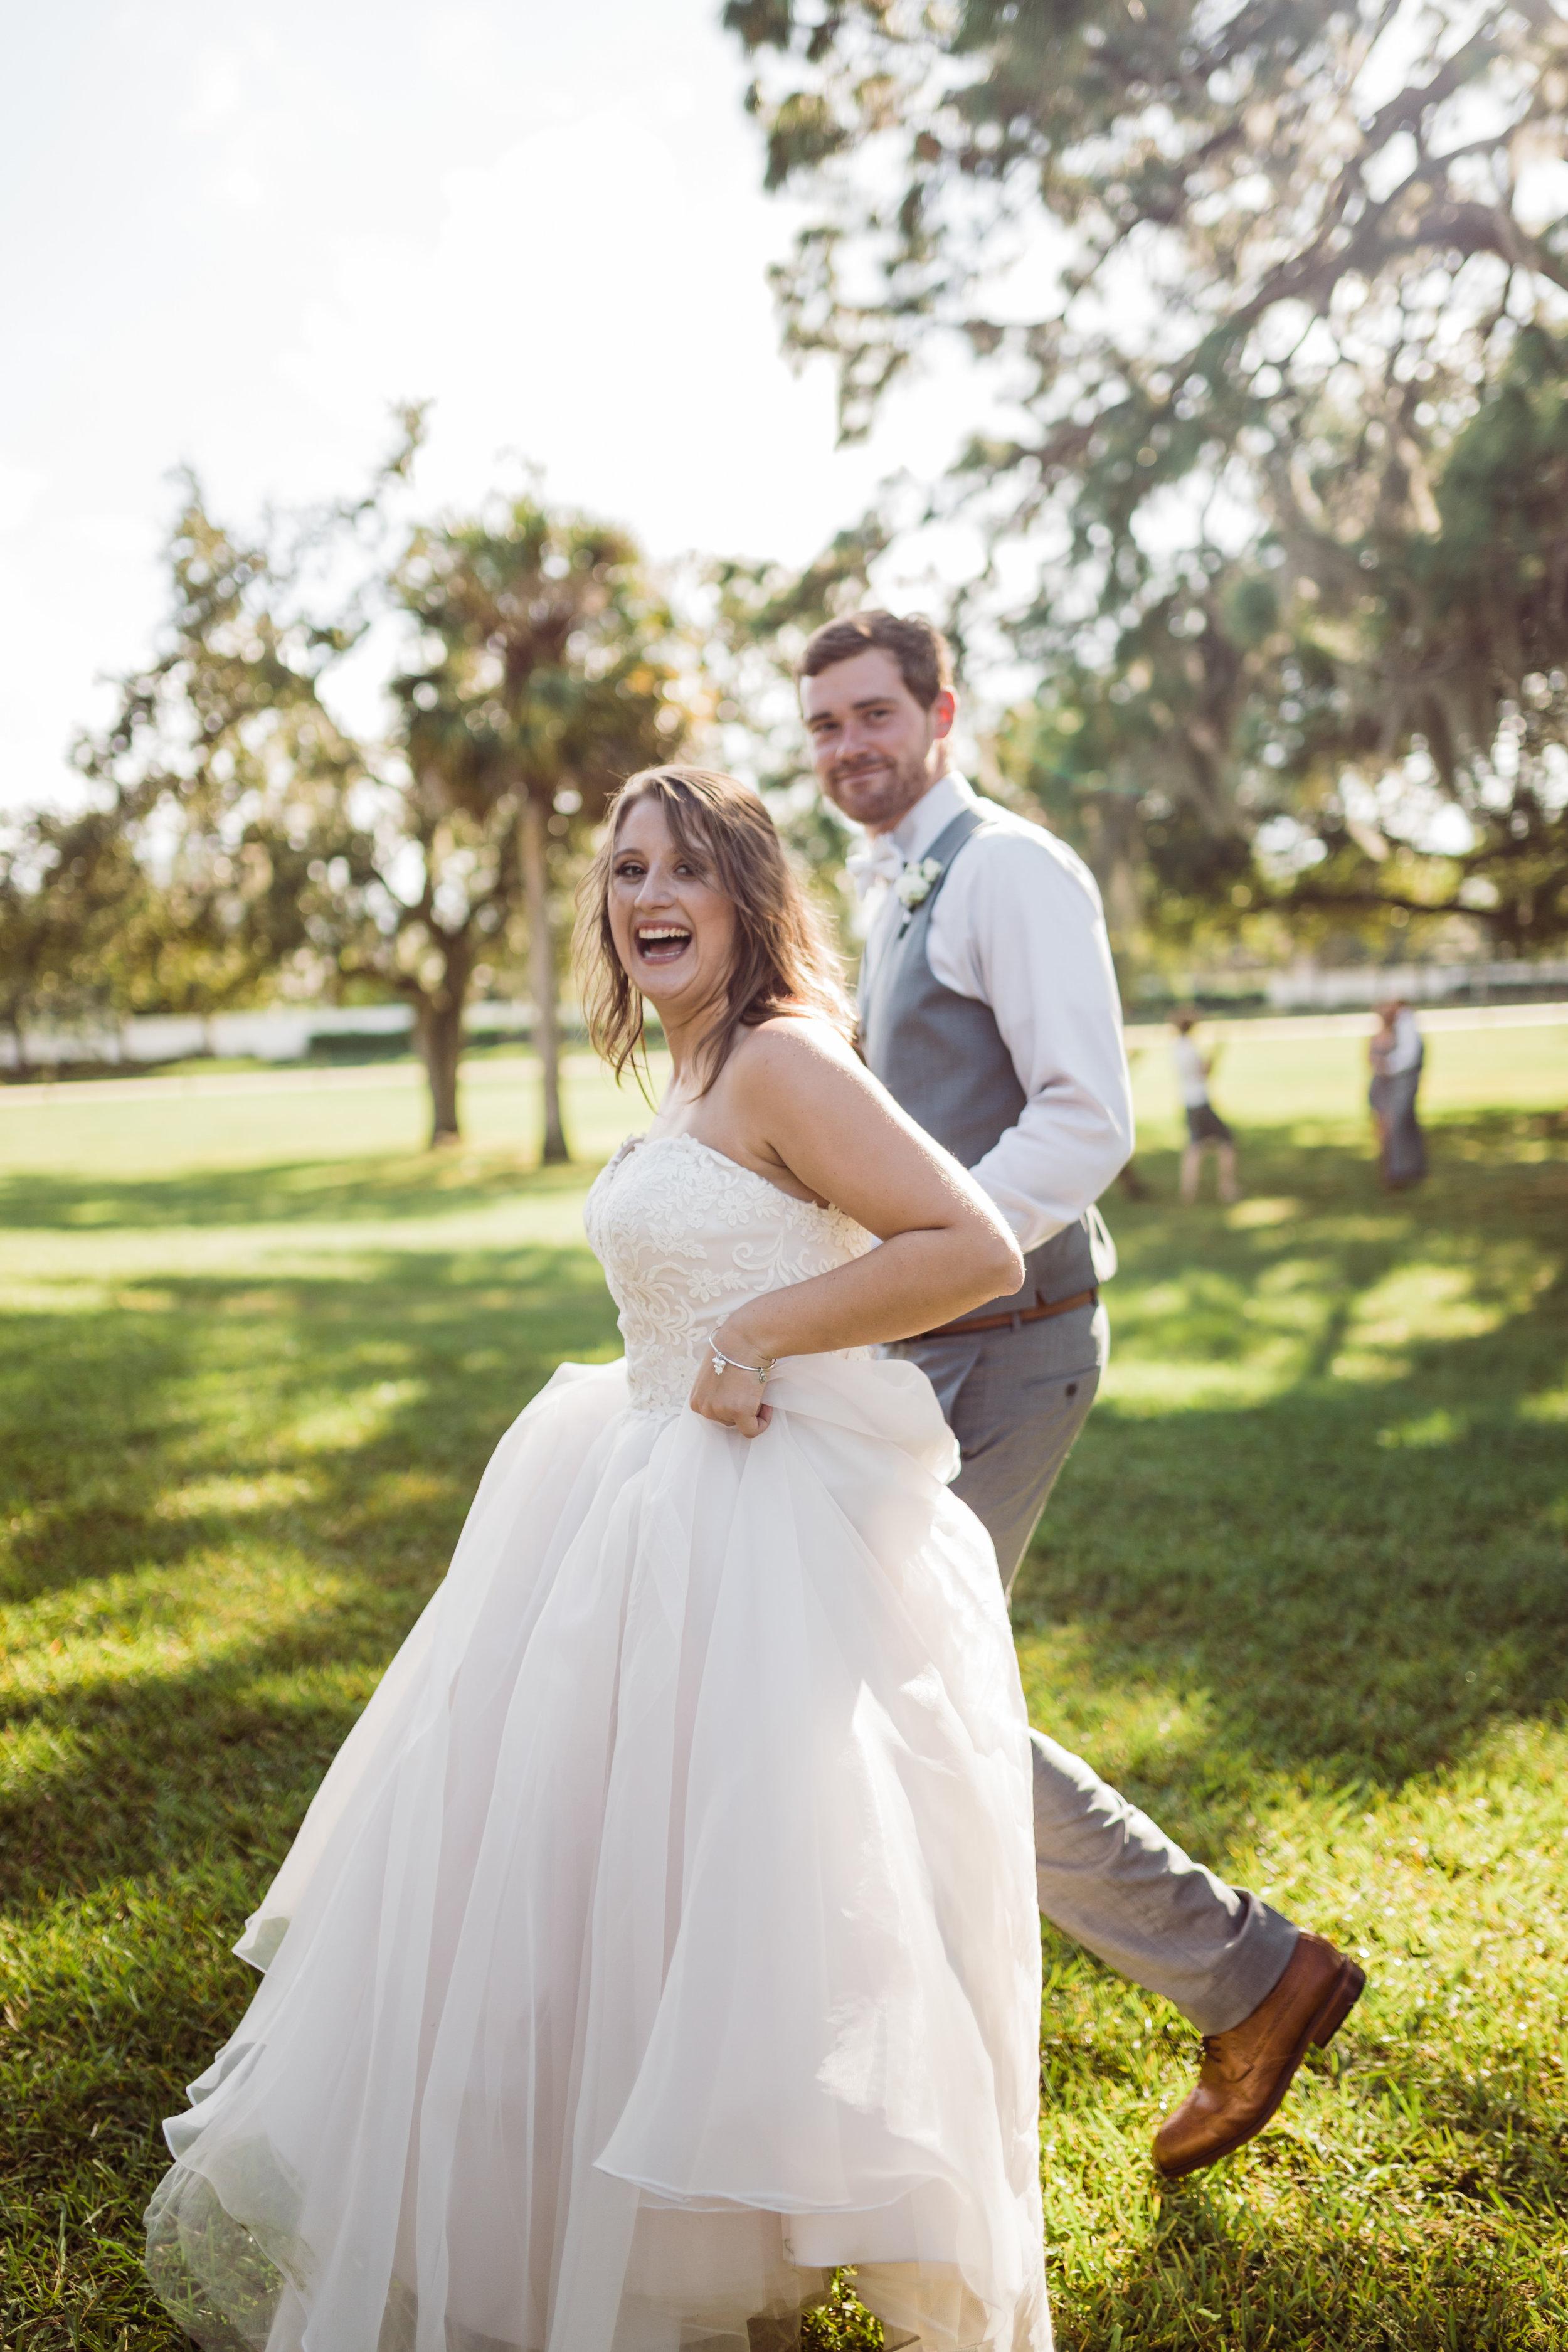 2017.10.14 Samantha and Matthew Crabtree Sarasota Wedding (380 of 708).jpg